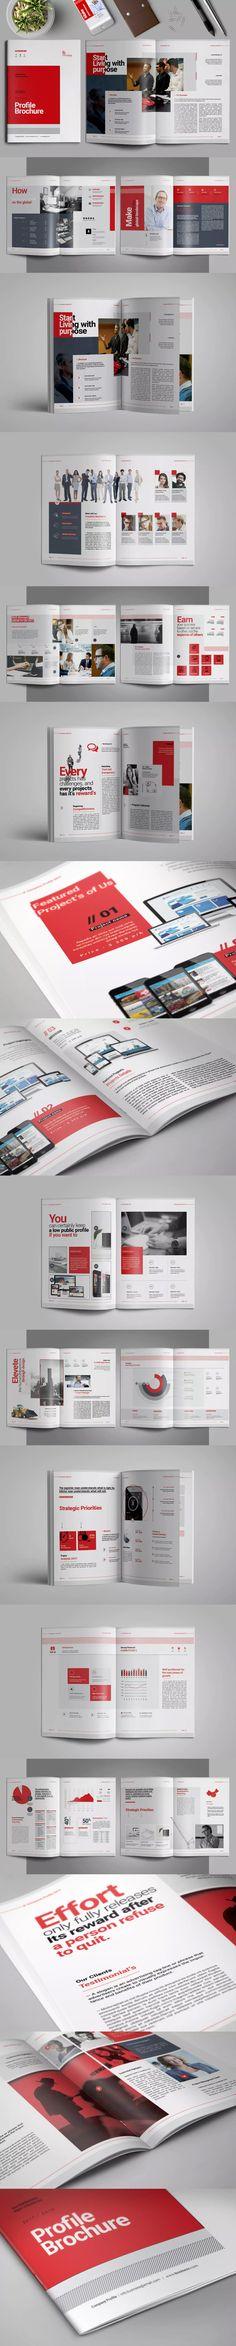 Company Profile Template InDesign INDD A4 | Company Profile Design ...